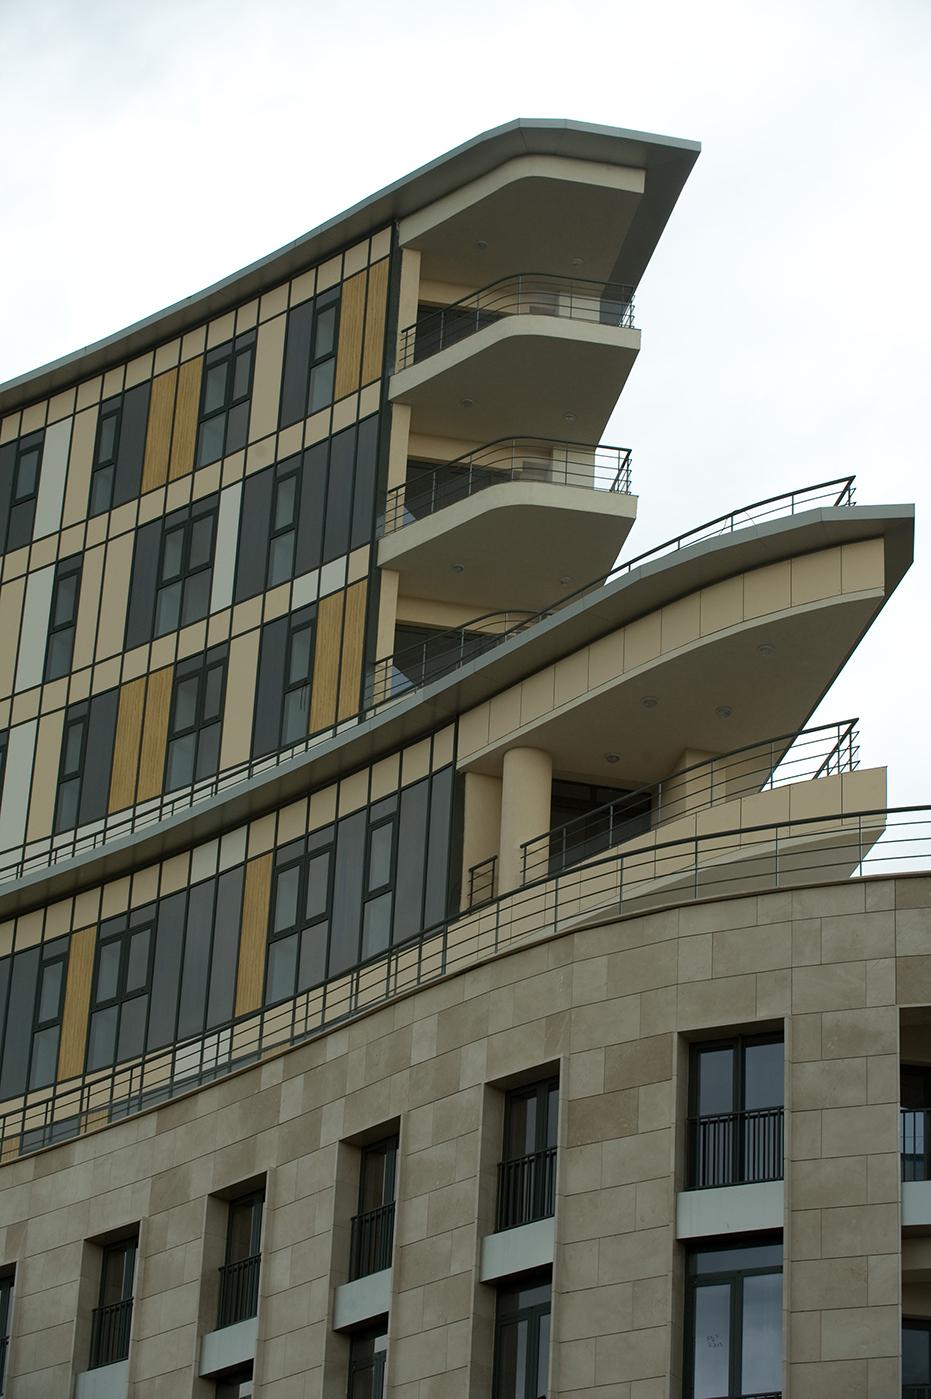 Selecta-Evo-Casa-Apartamentos-Ferdinand.-Bucarest-Rumania.-larson-PE-champagne-2_1585897642.jpg